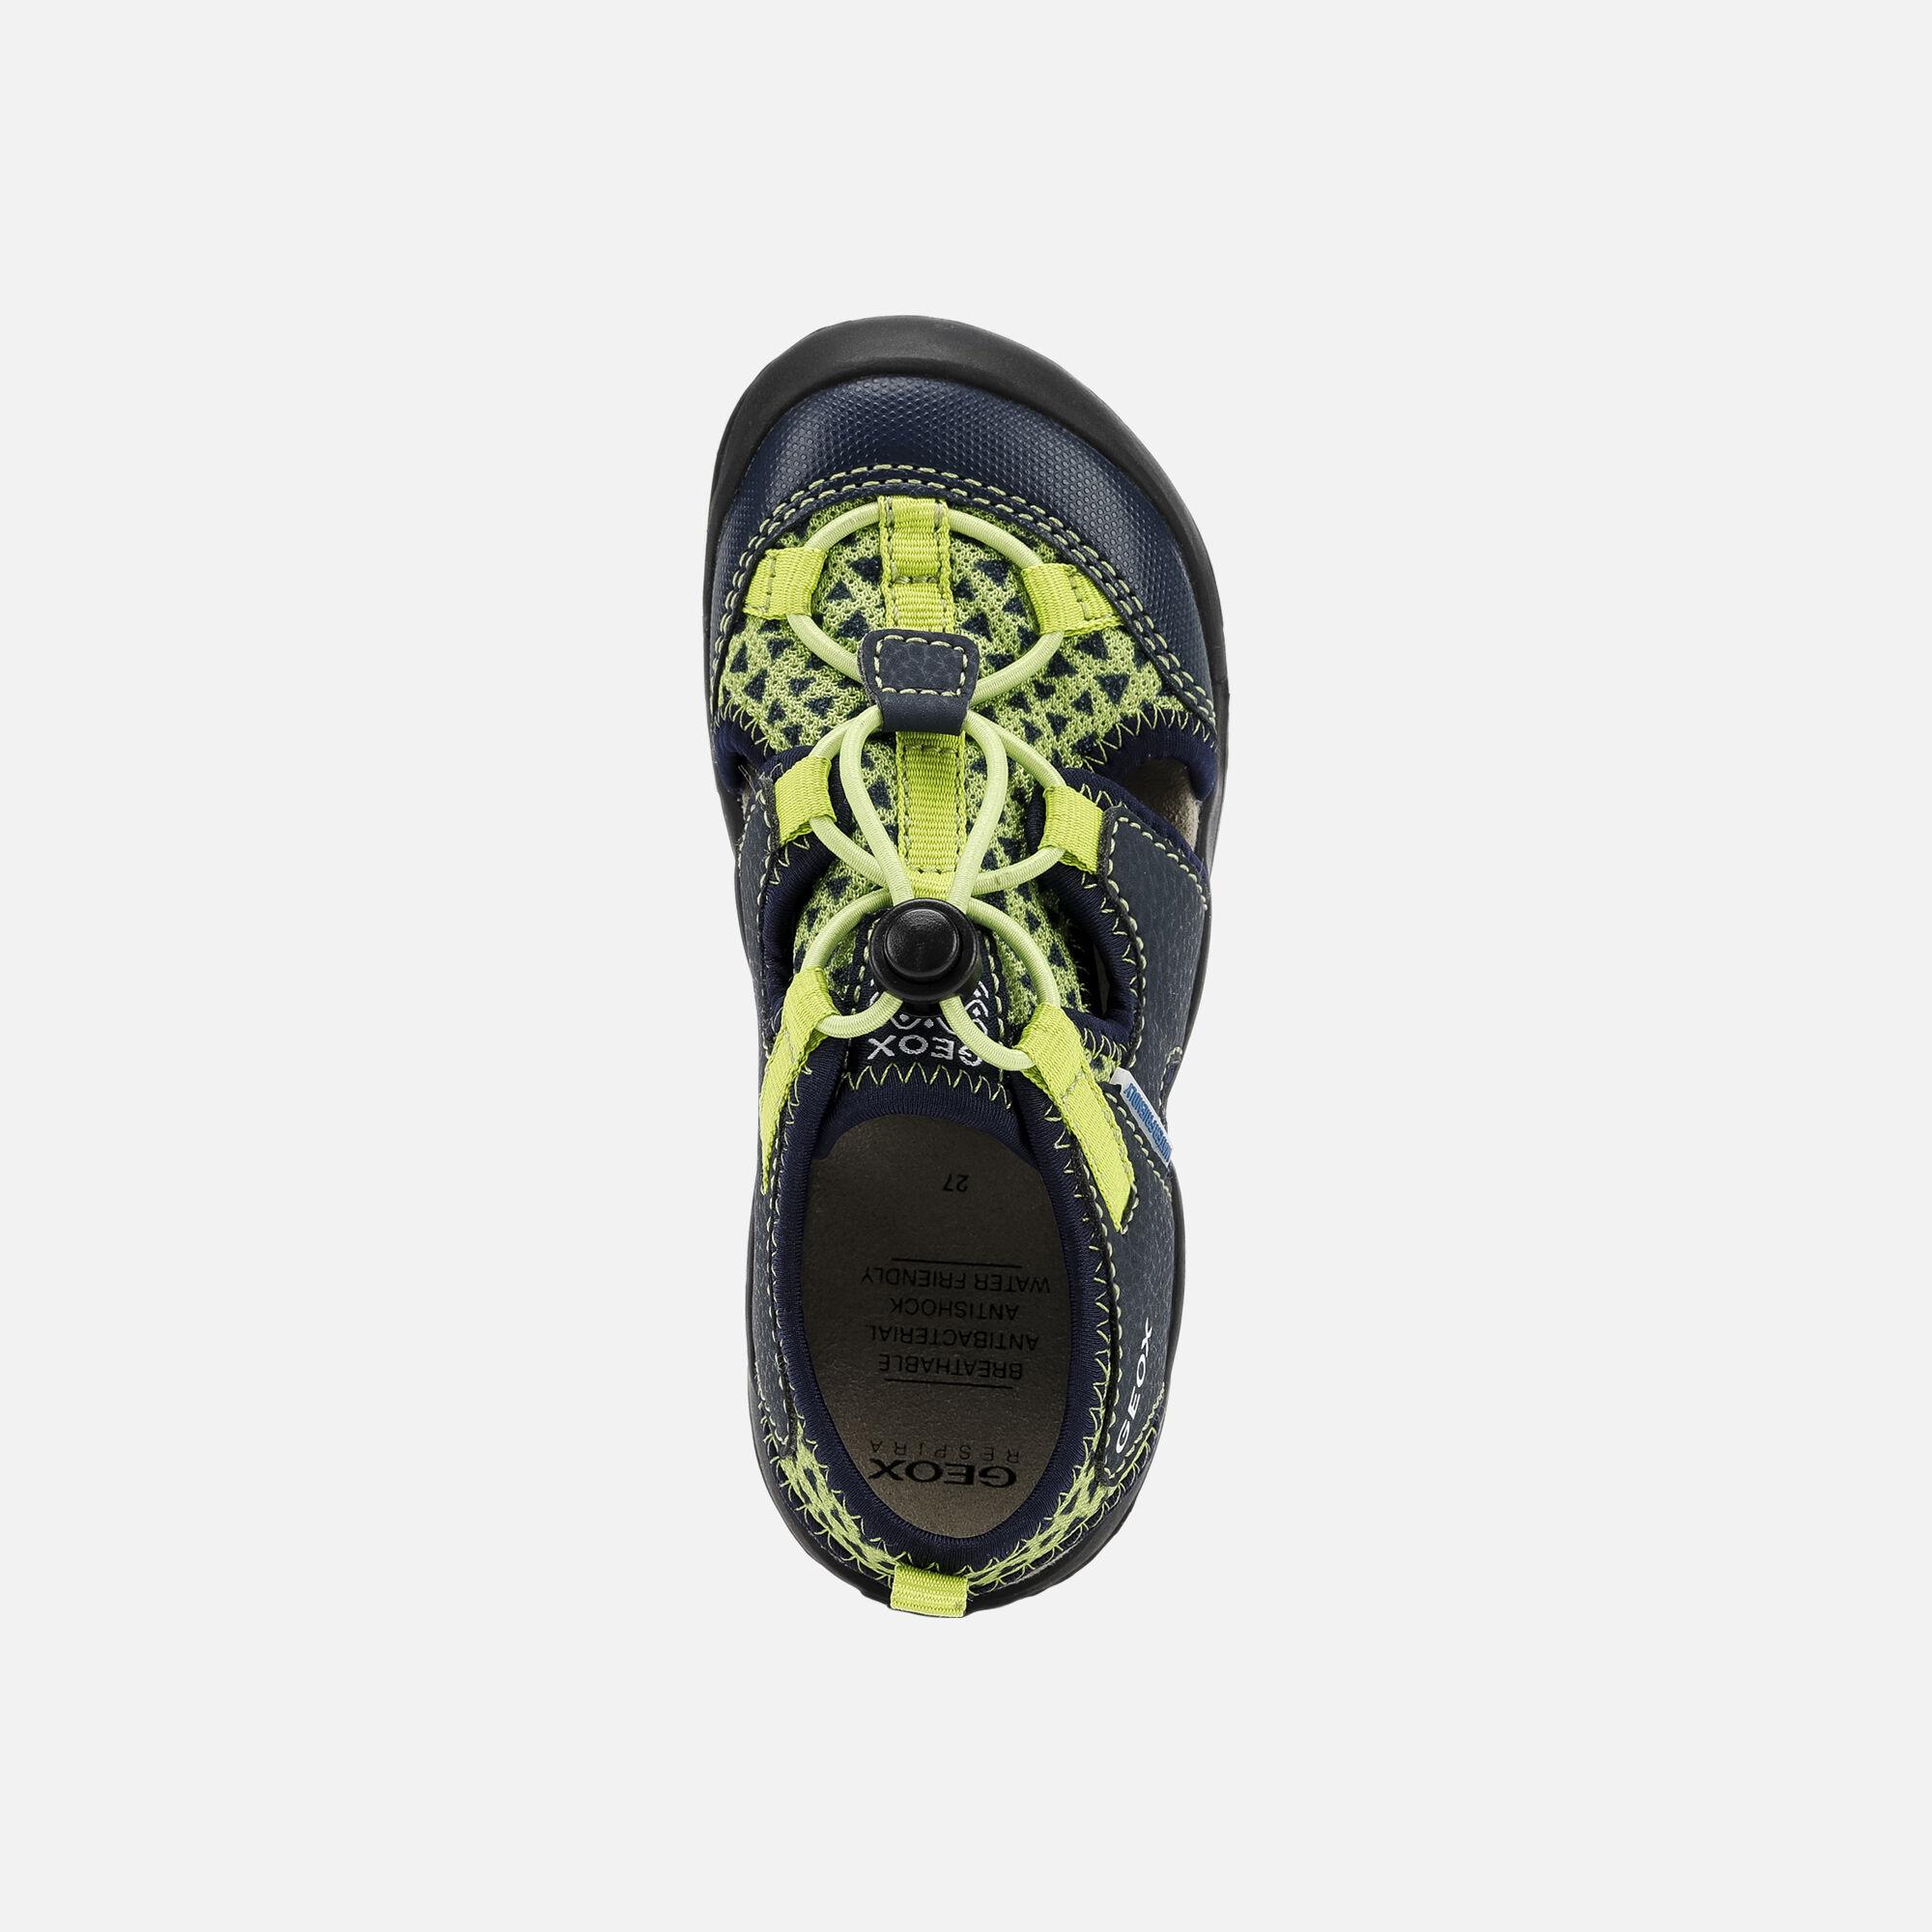 Geox JR SANDAL KYLE: Yellow and Blue Junior Boy Sandals|